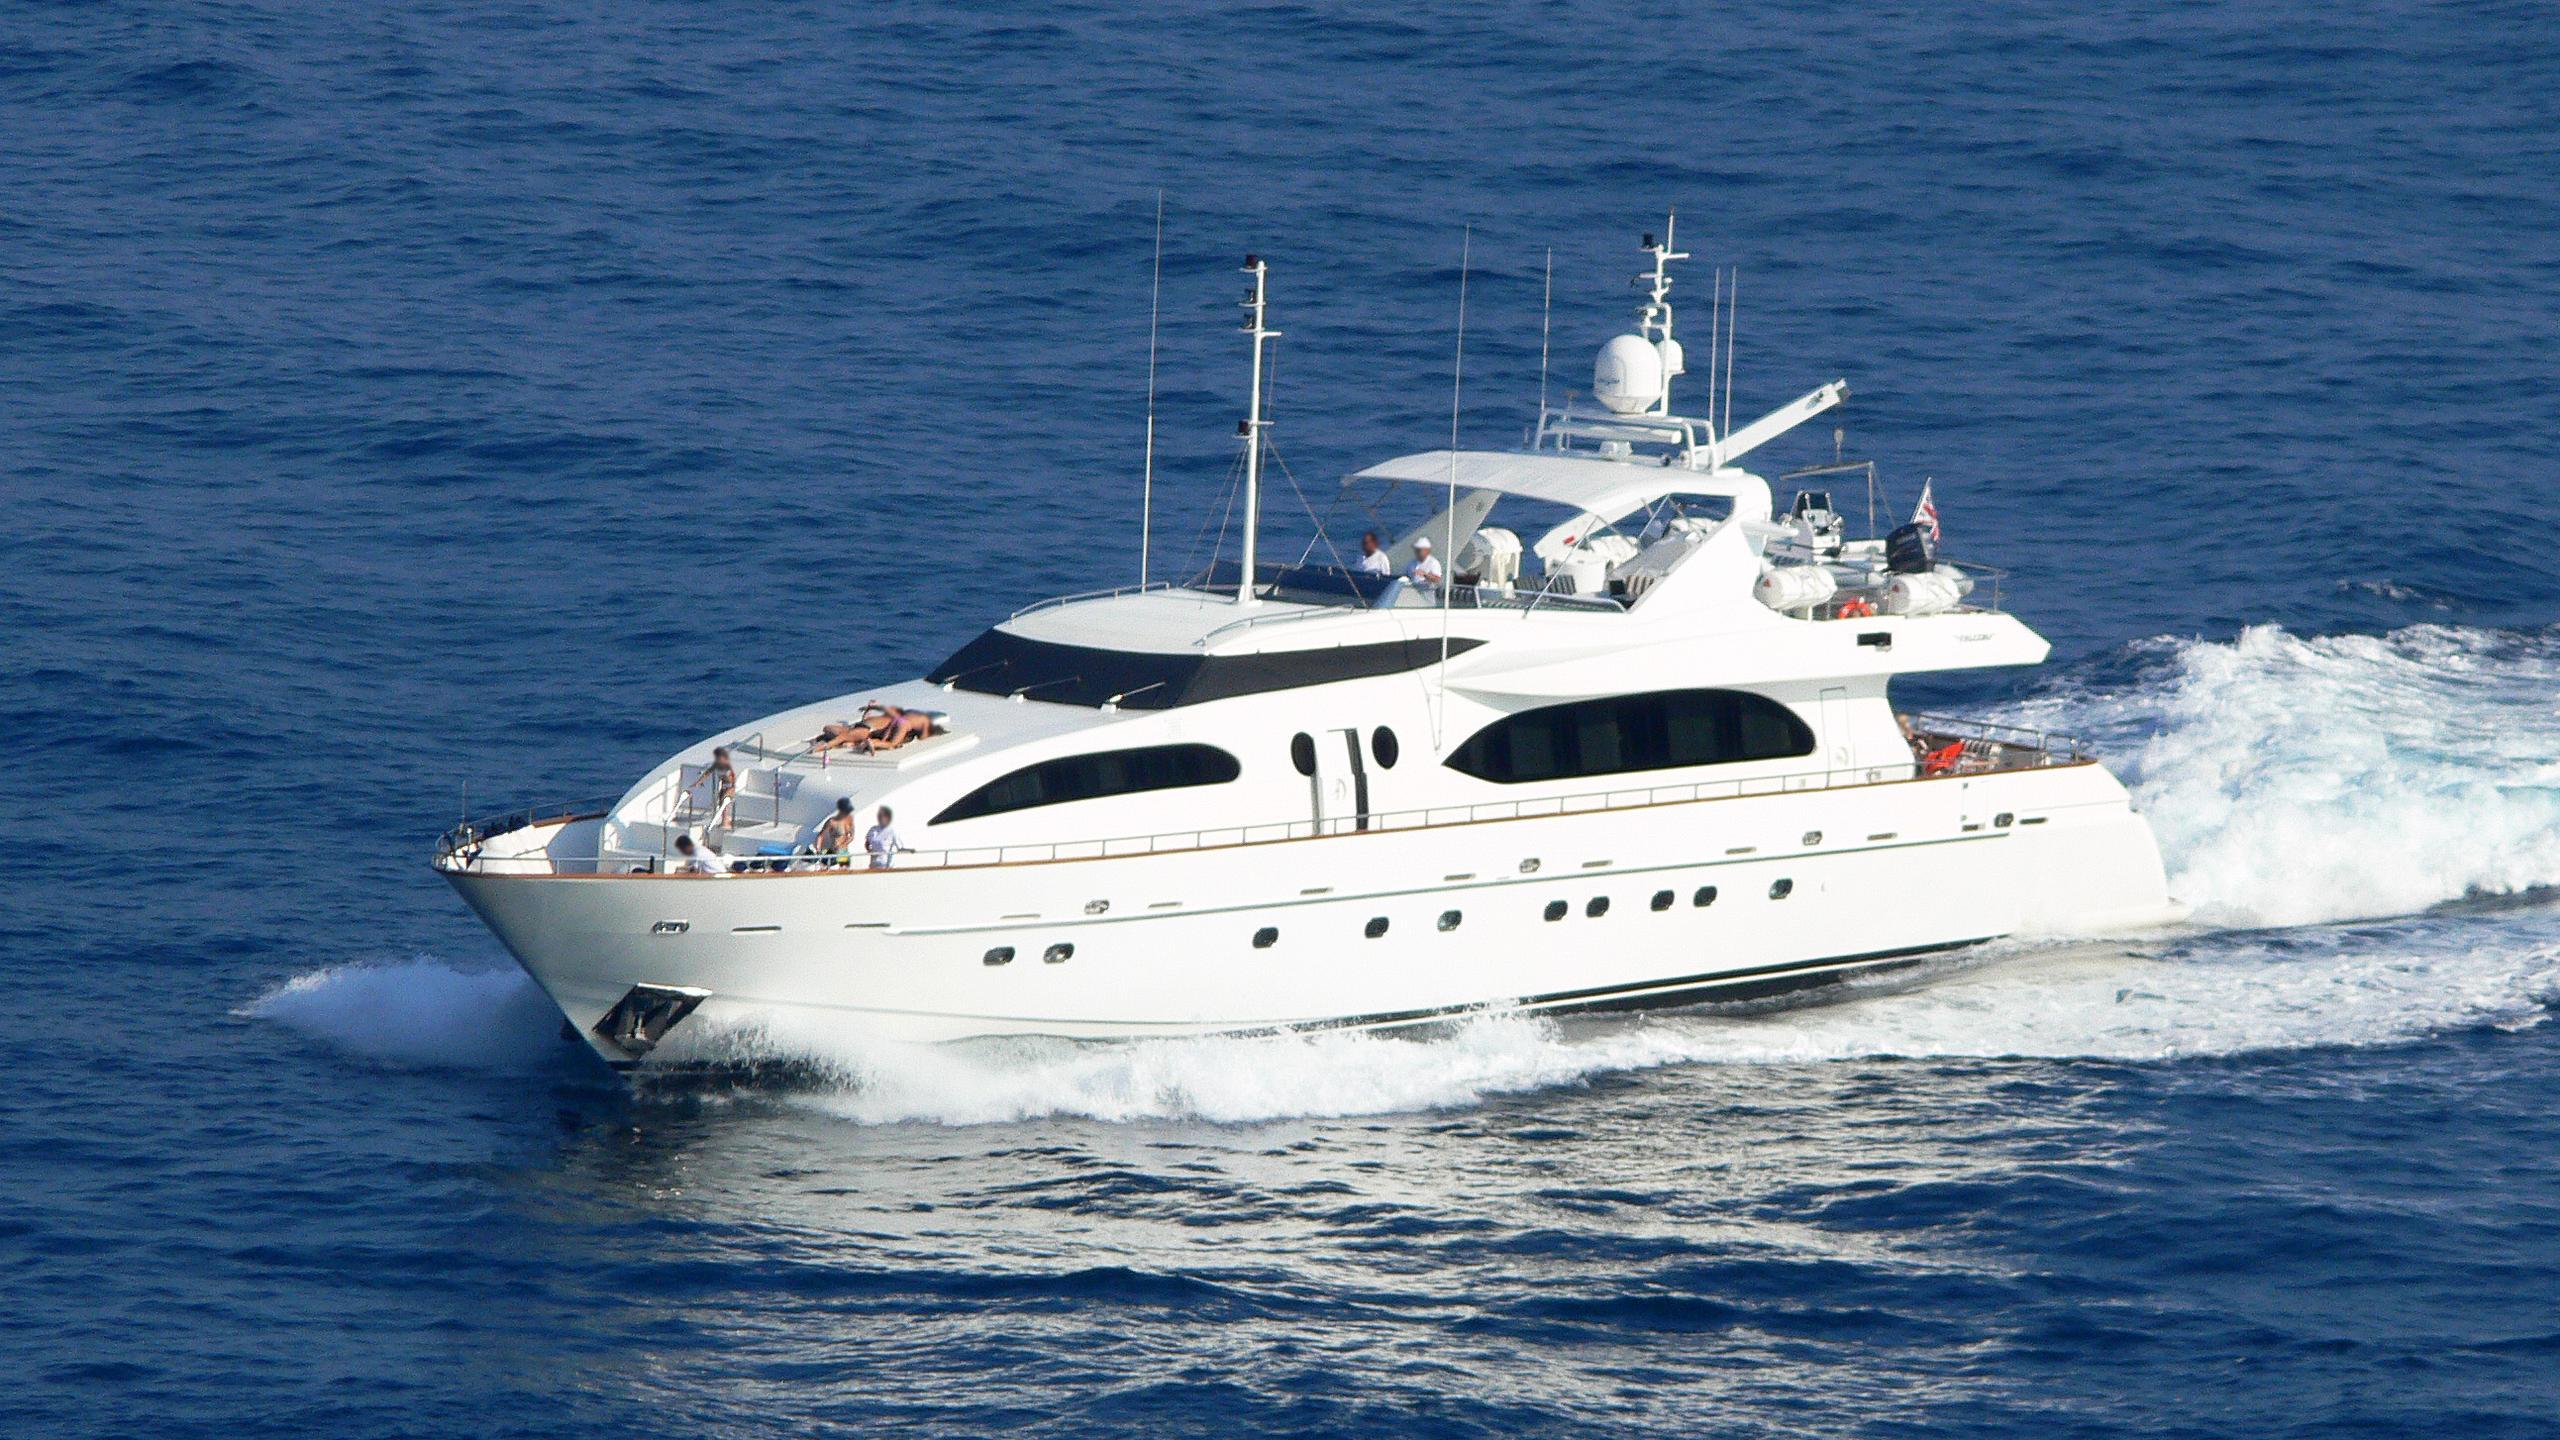 ester-motor-yacht-falcon-115-2007-35m-cruising-half-profile